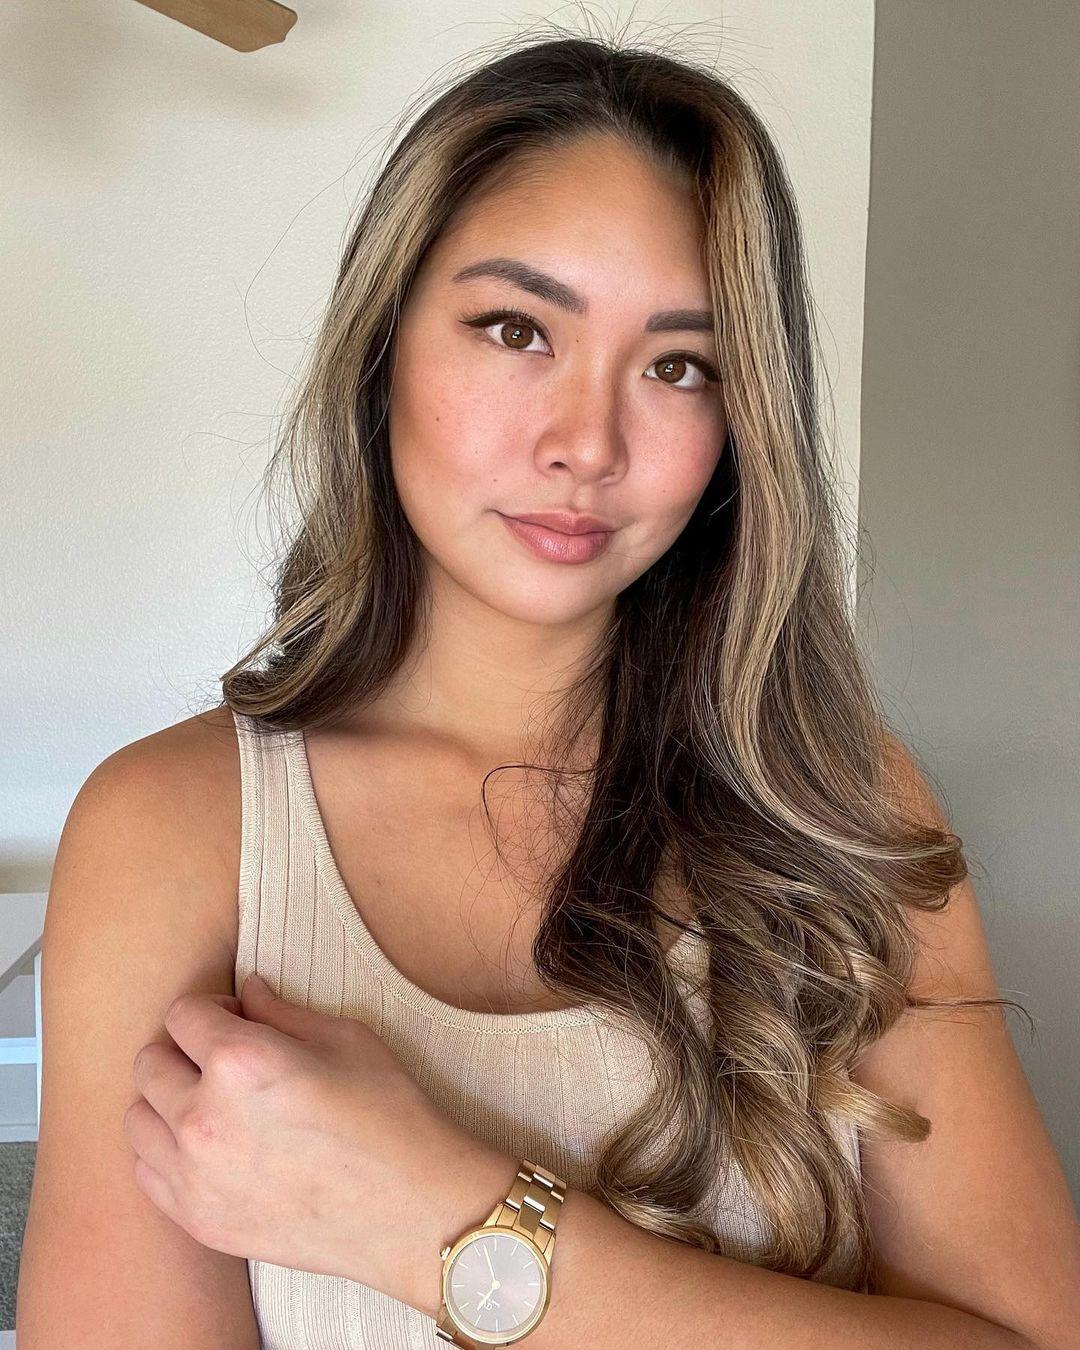 Vivian-Jasmine-Yu-Wallpapers-Insta-Fit-Bio-13